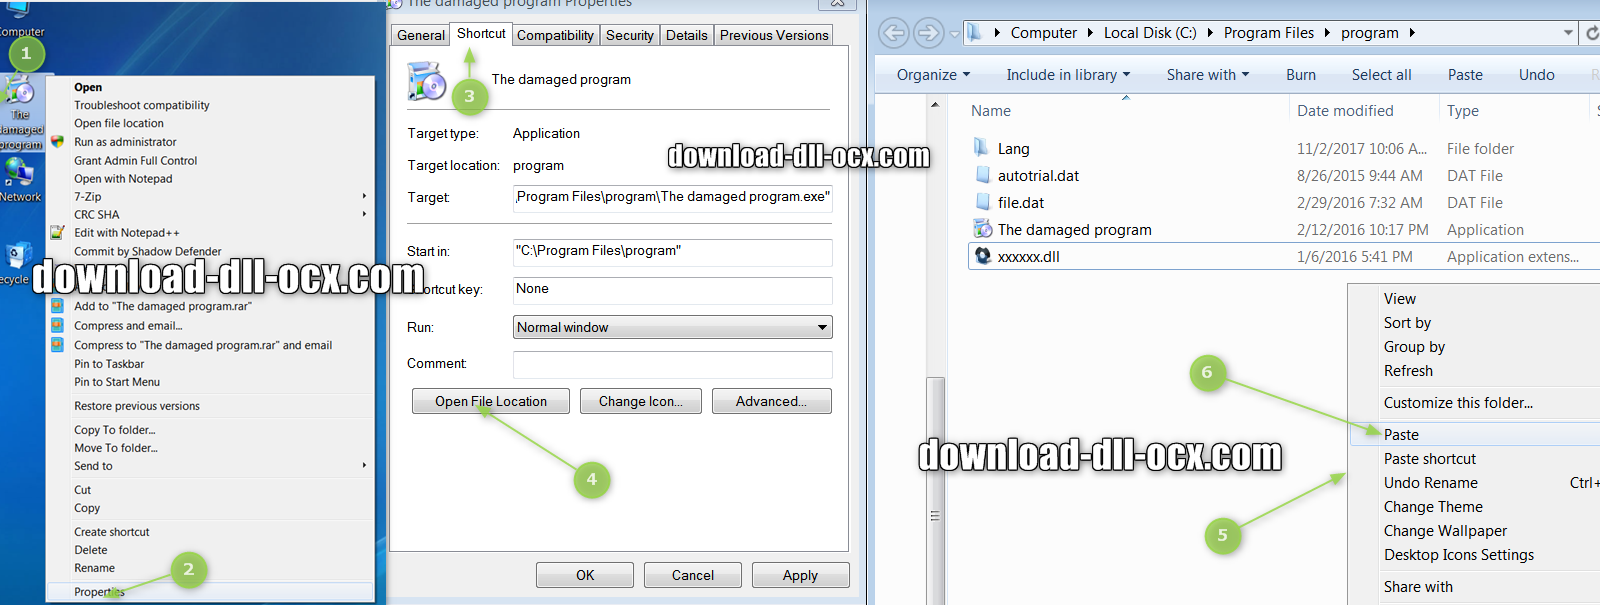 how to install jgewgen.dll file? for fix missing